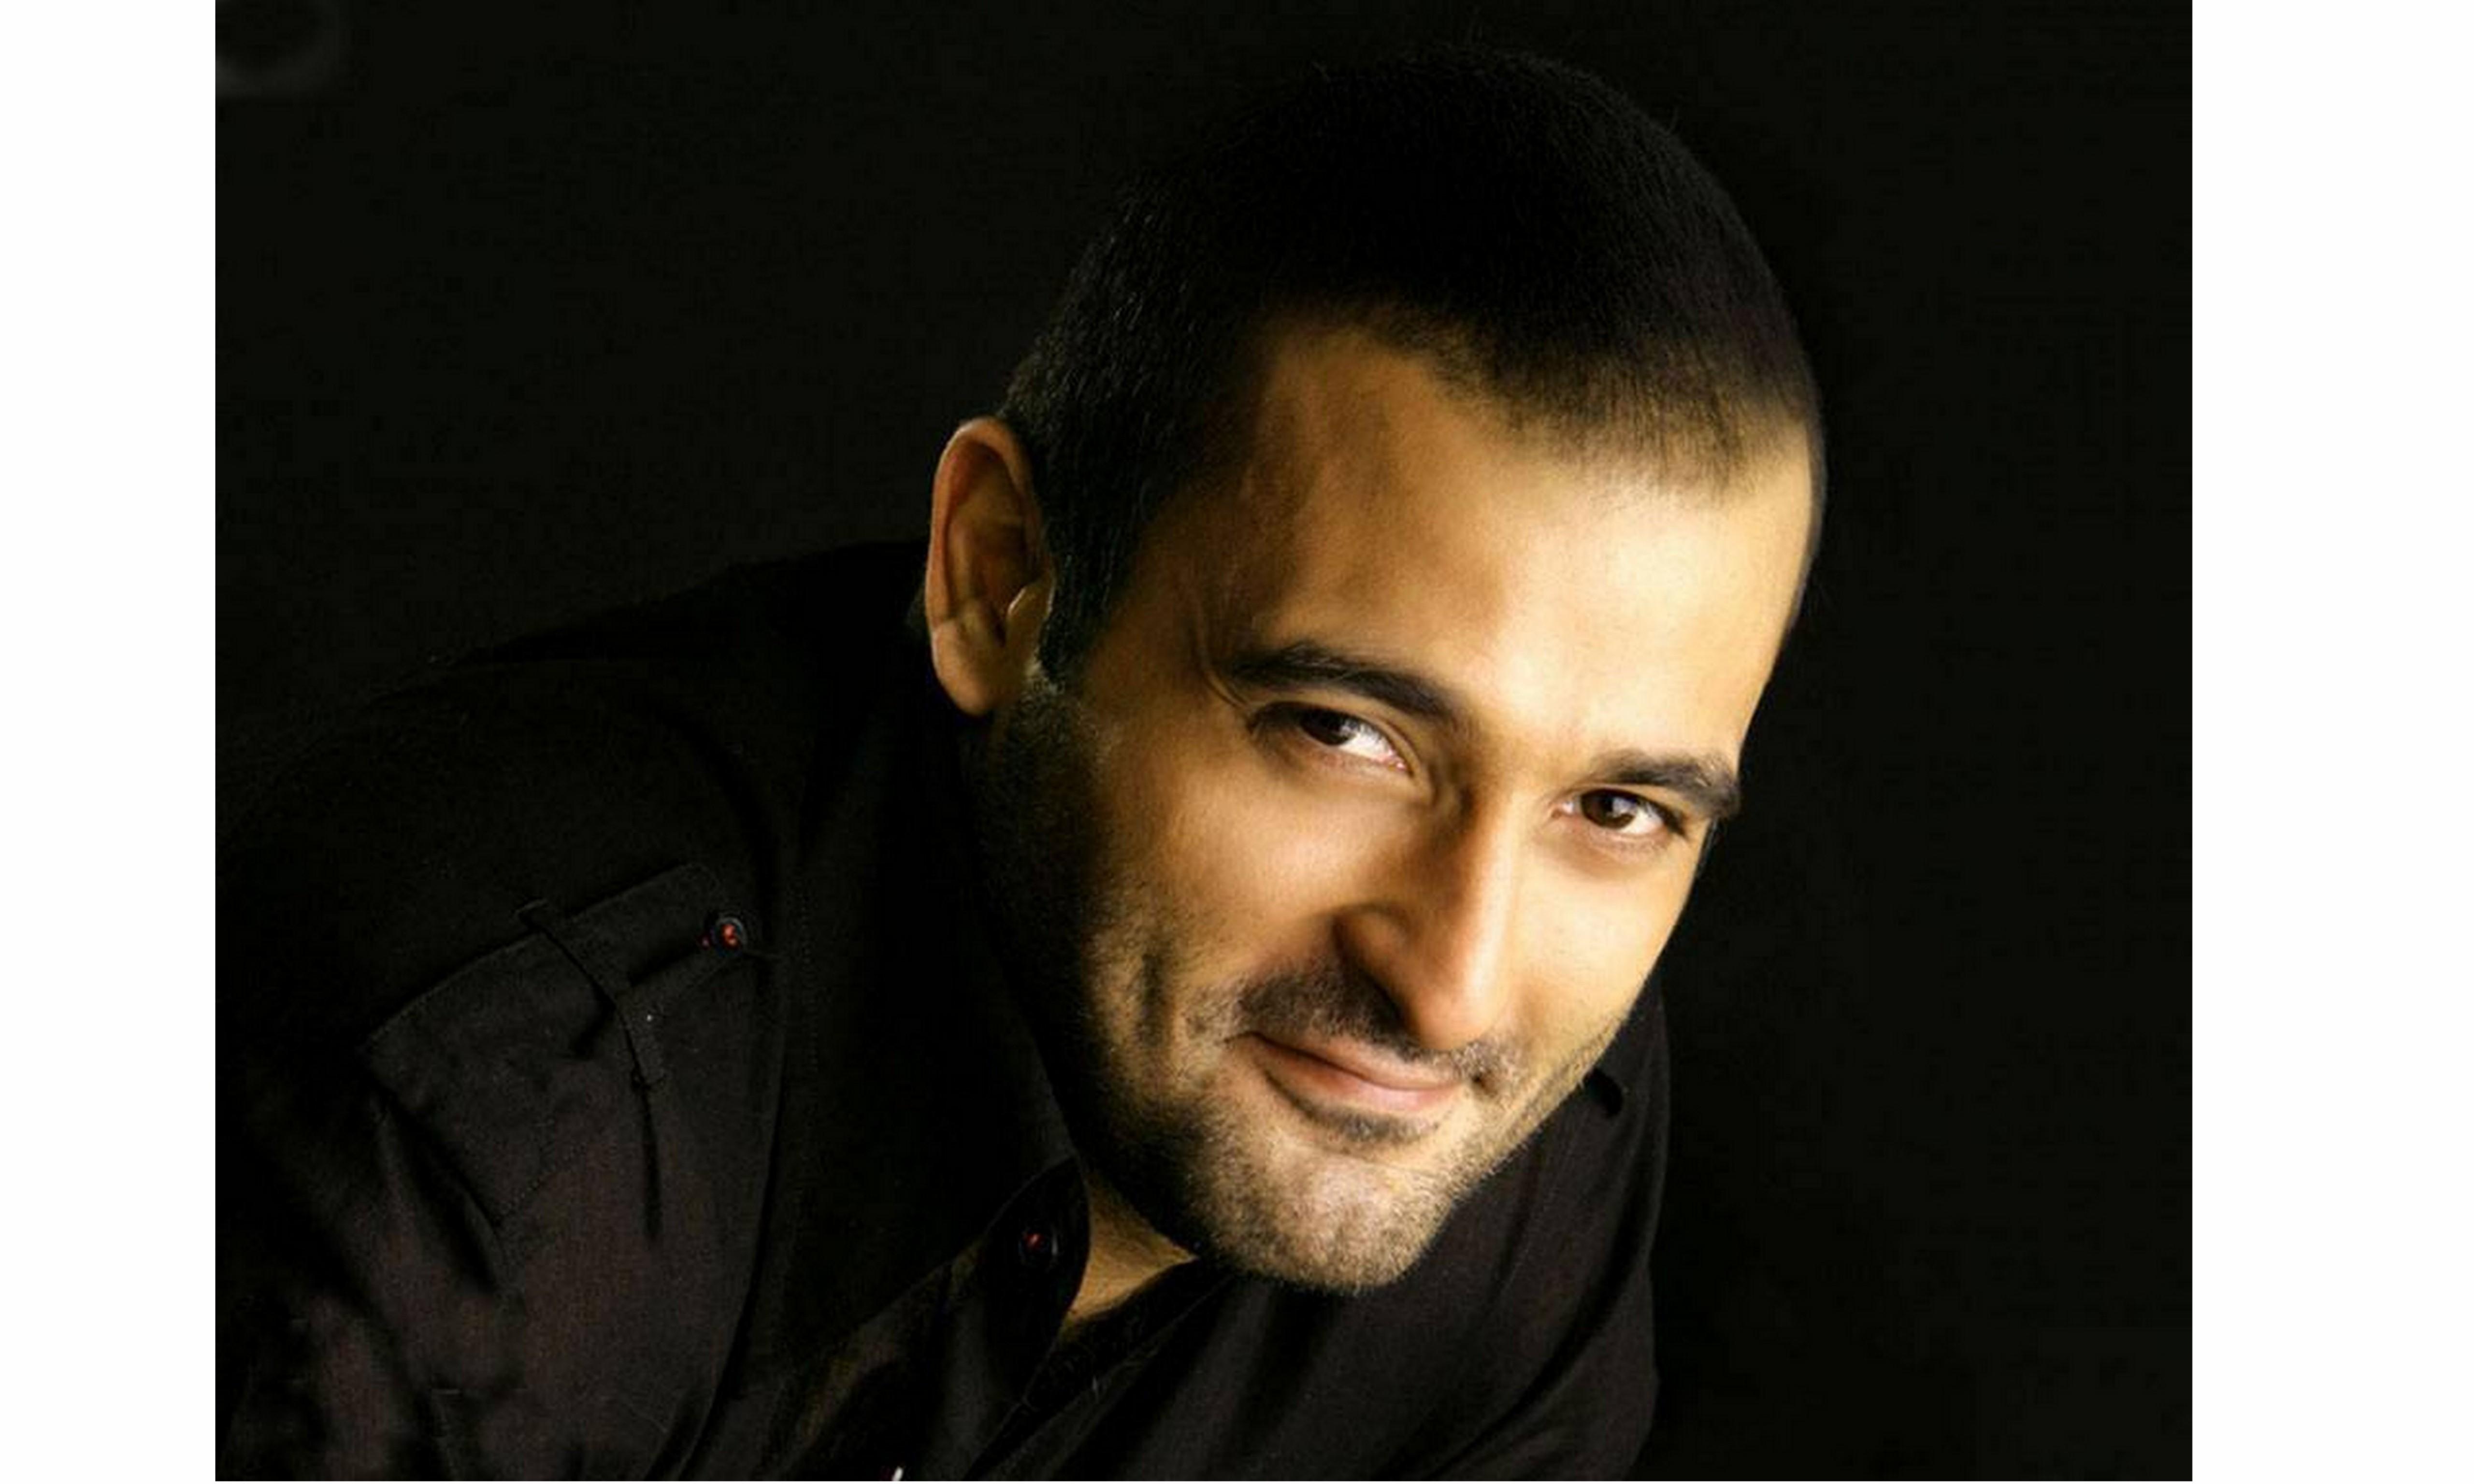 AKSHAYE KHANNA: EVERY ACTOR HAS A CERTAIN SHELF LIFE!